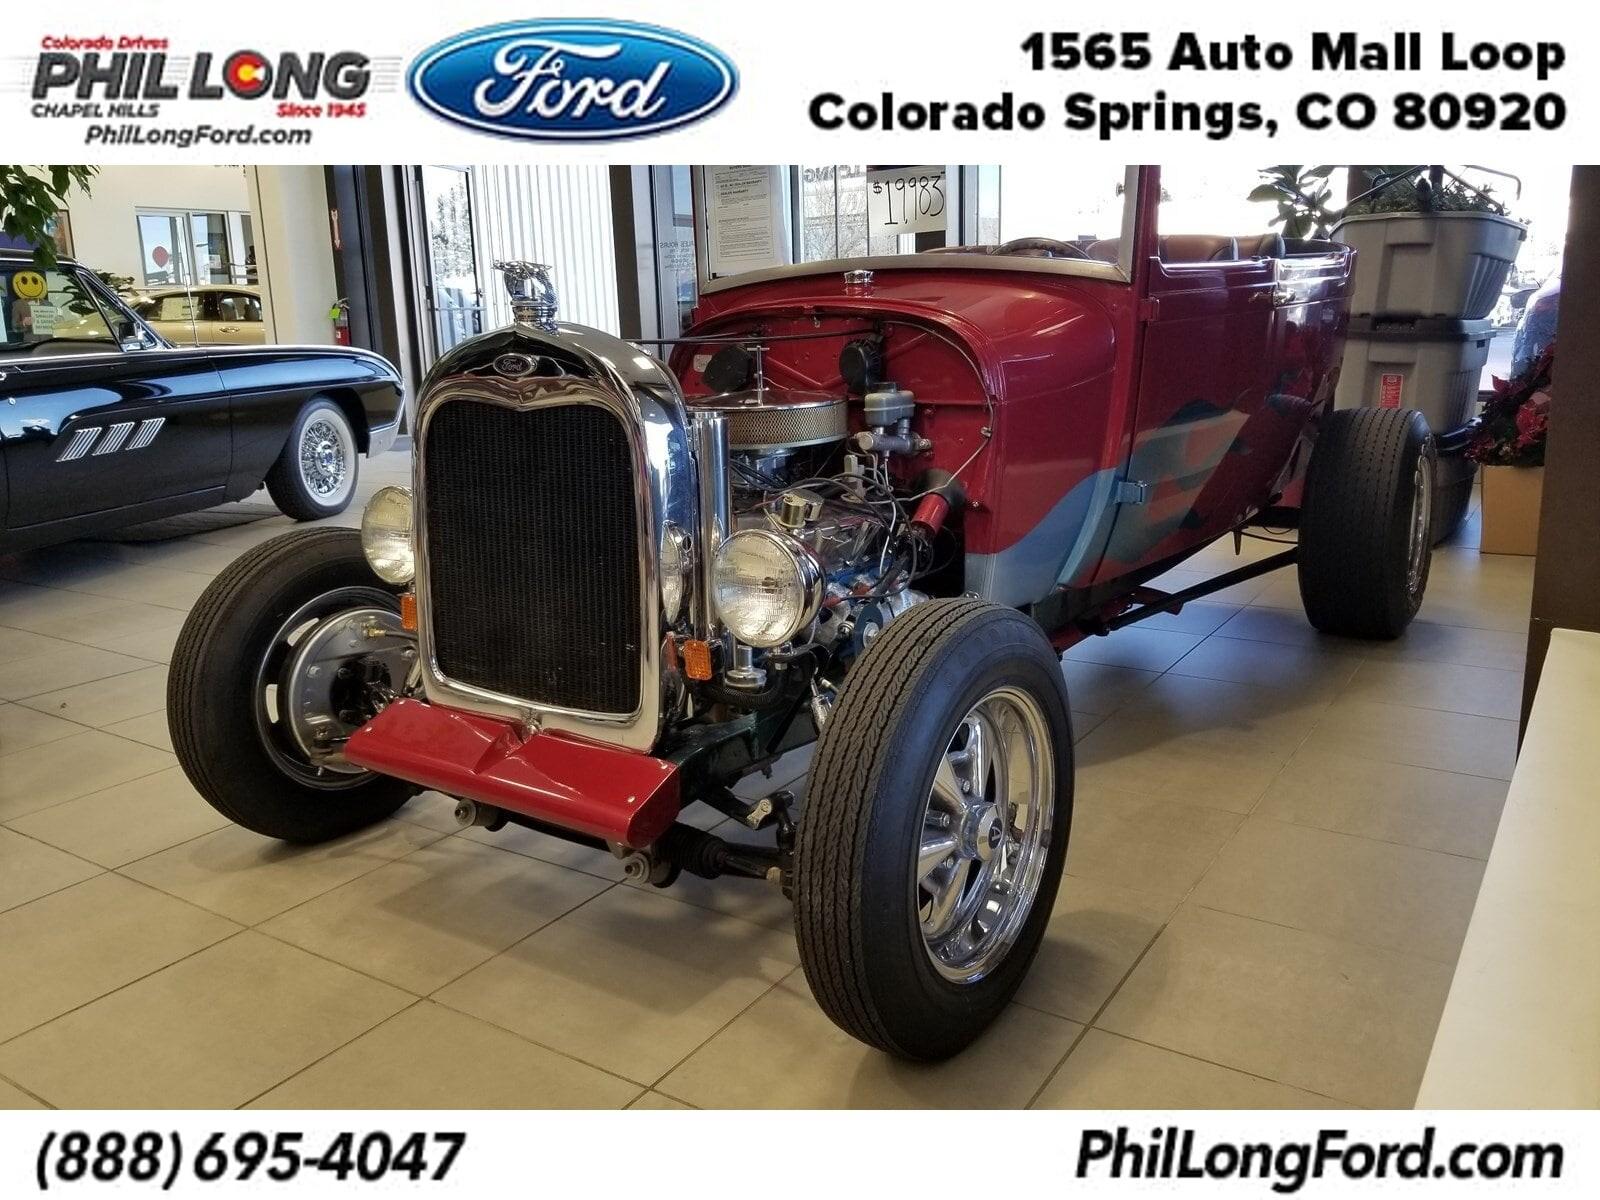 Used Ford Cars Trucks Colorado Springs